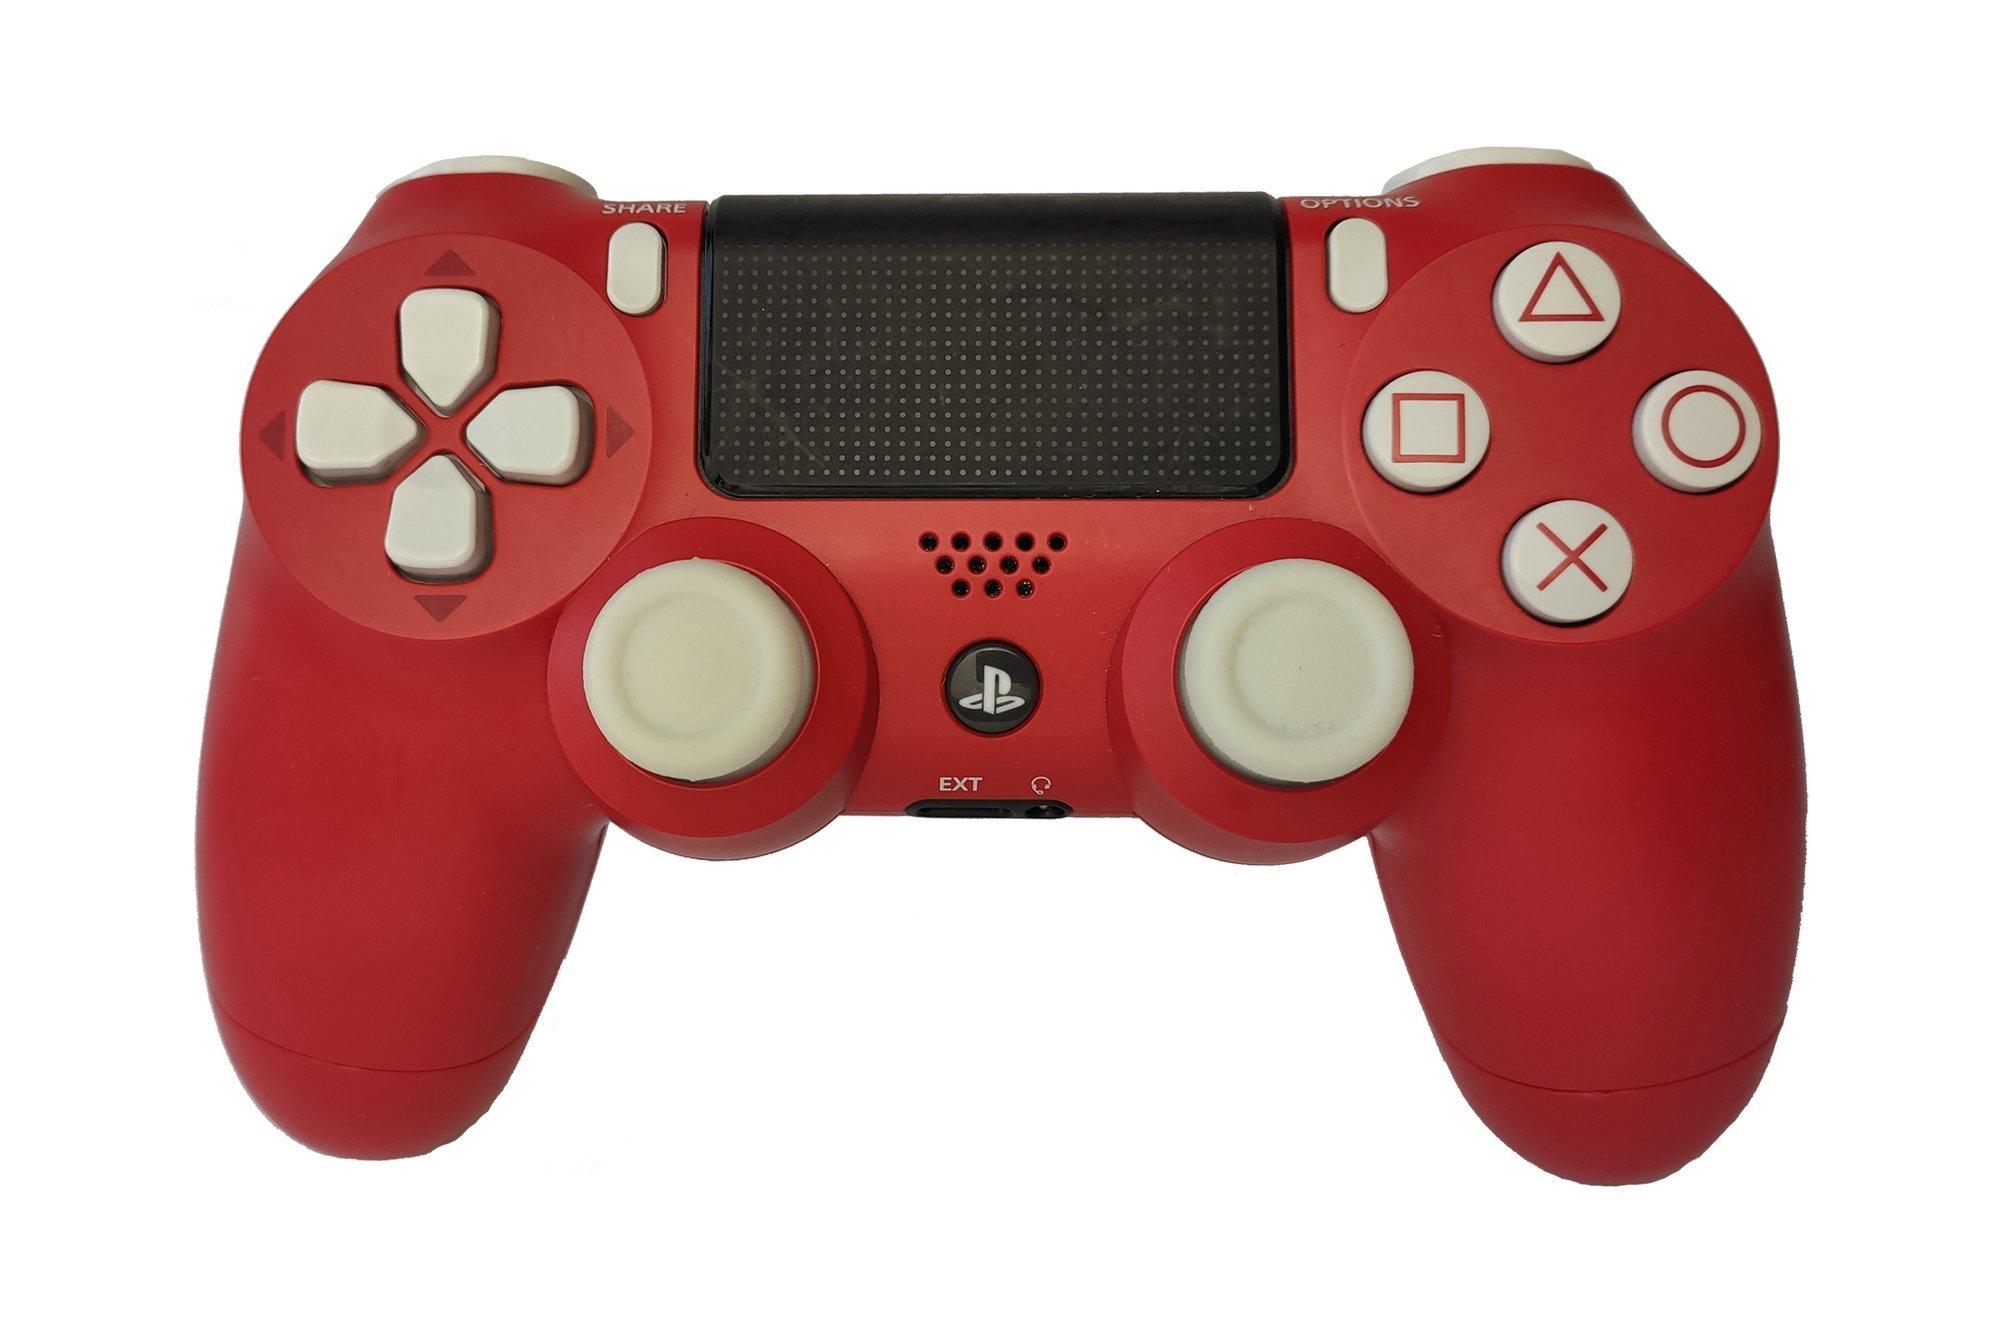 Controller Gamepad Playstation 4 PS4 v2 Spiderman Unique